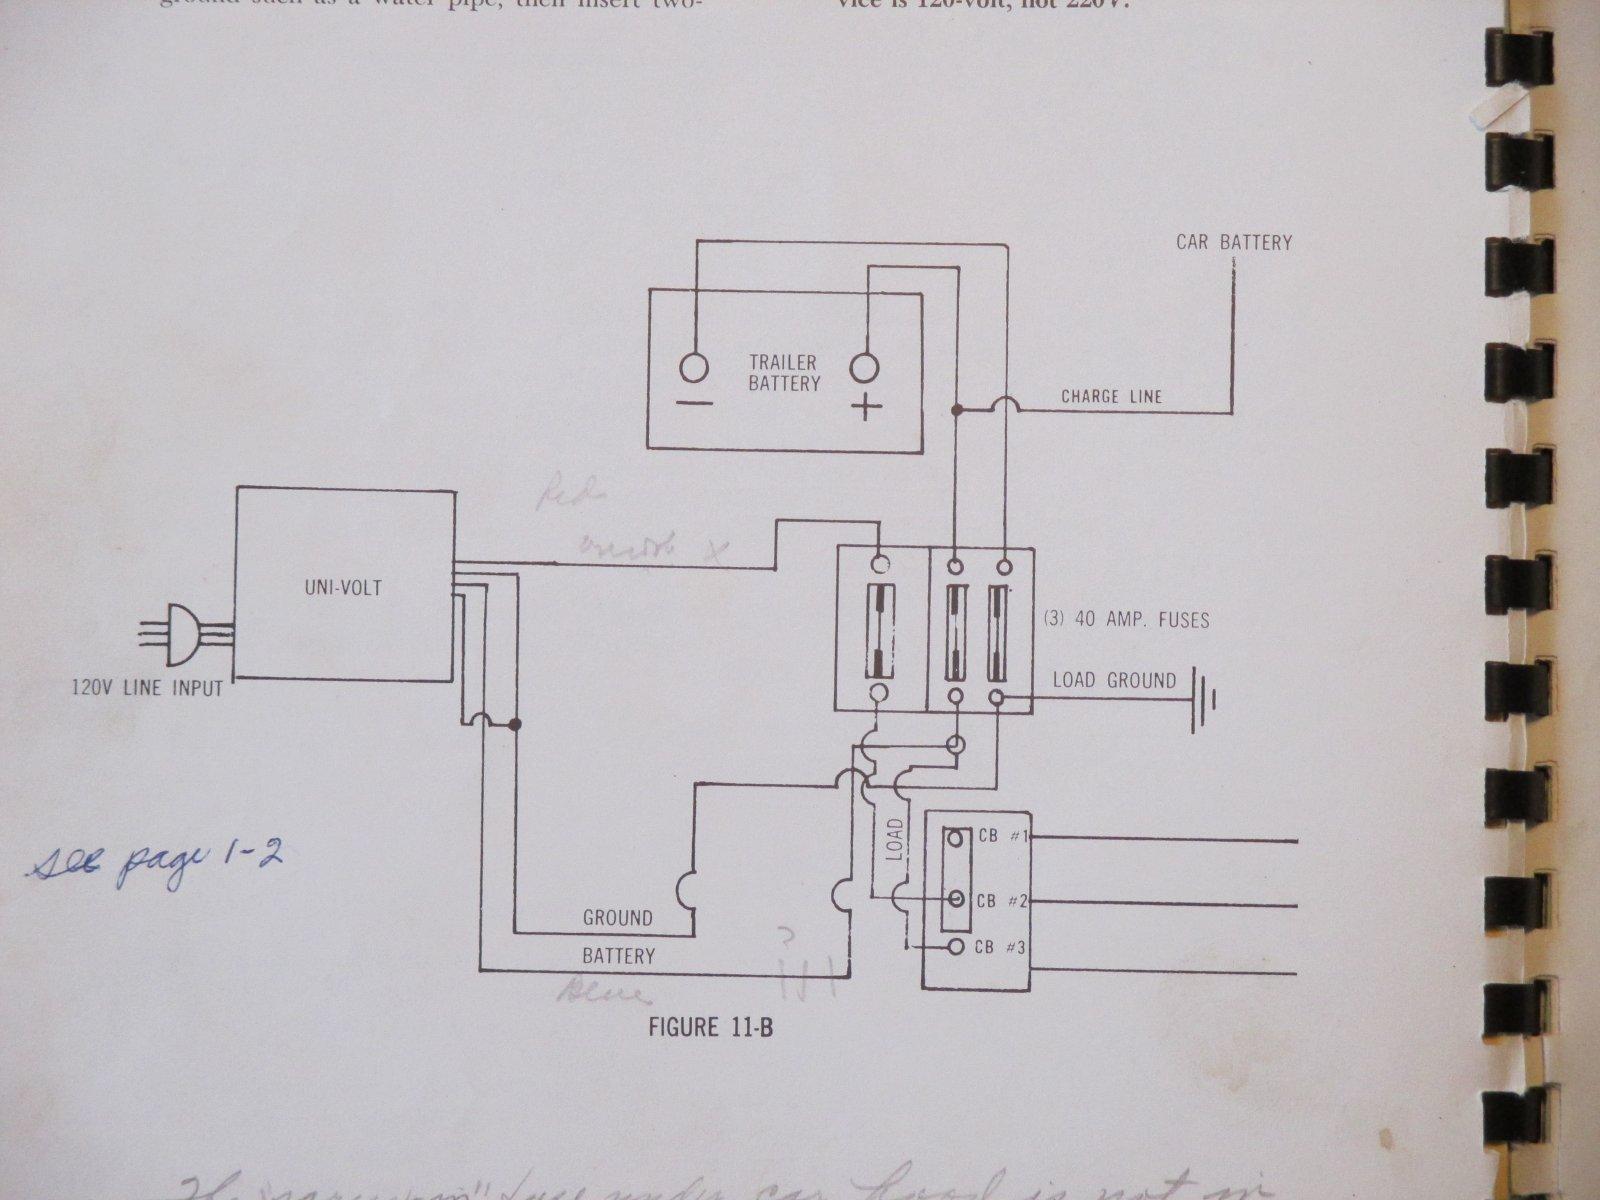 Click image for larger version  Name:1404 Univolt Wiring Diagram.jpg Views:146 Size:180.7 KB ID:240964